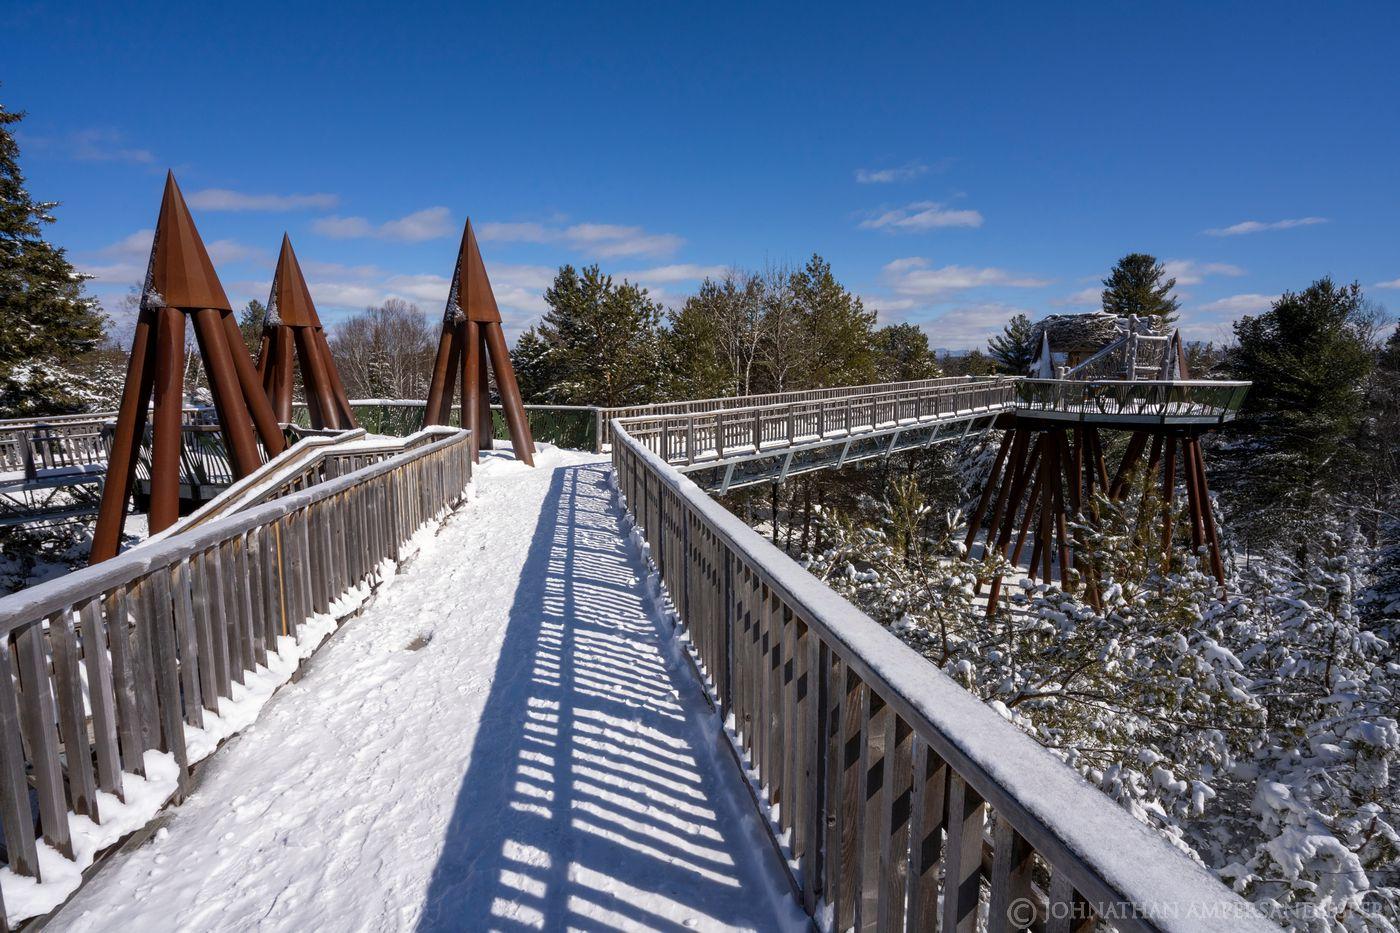 The Wild Center,Tupper Lake, Canopy Walk,